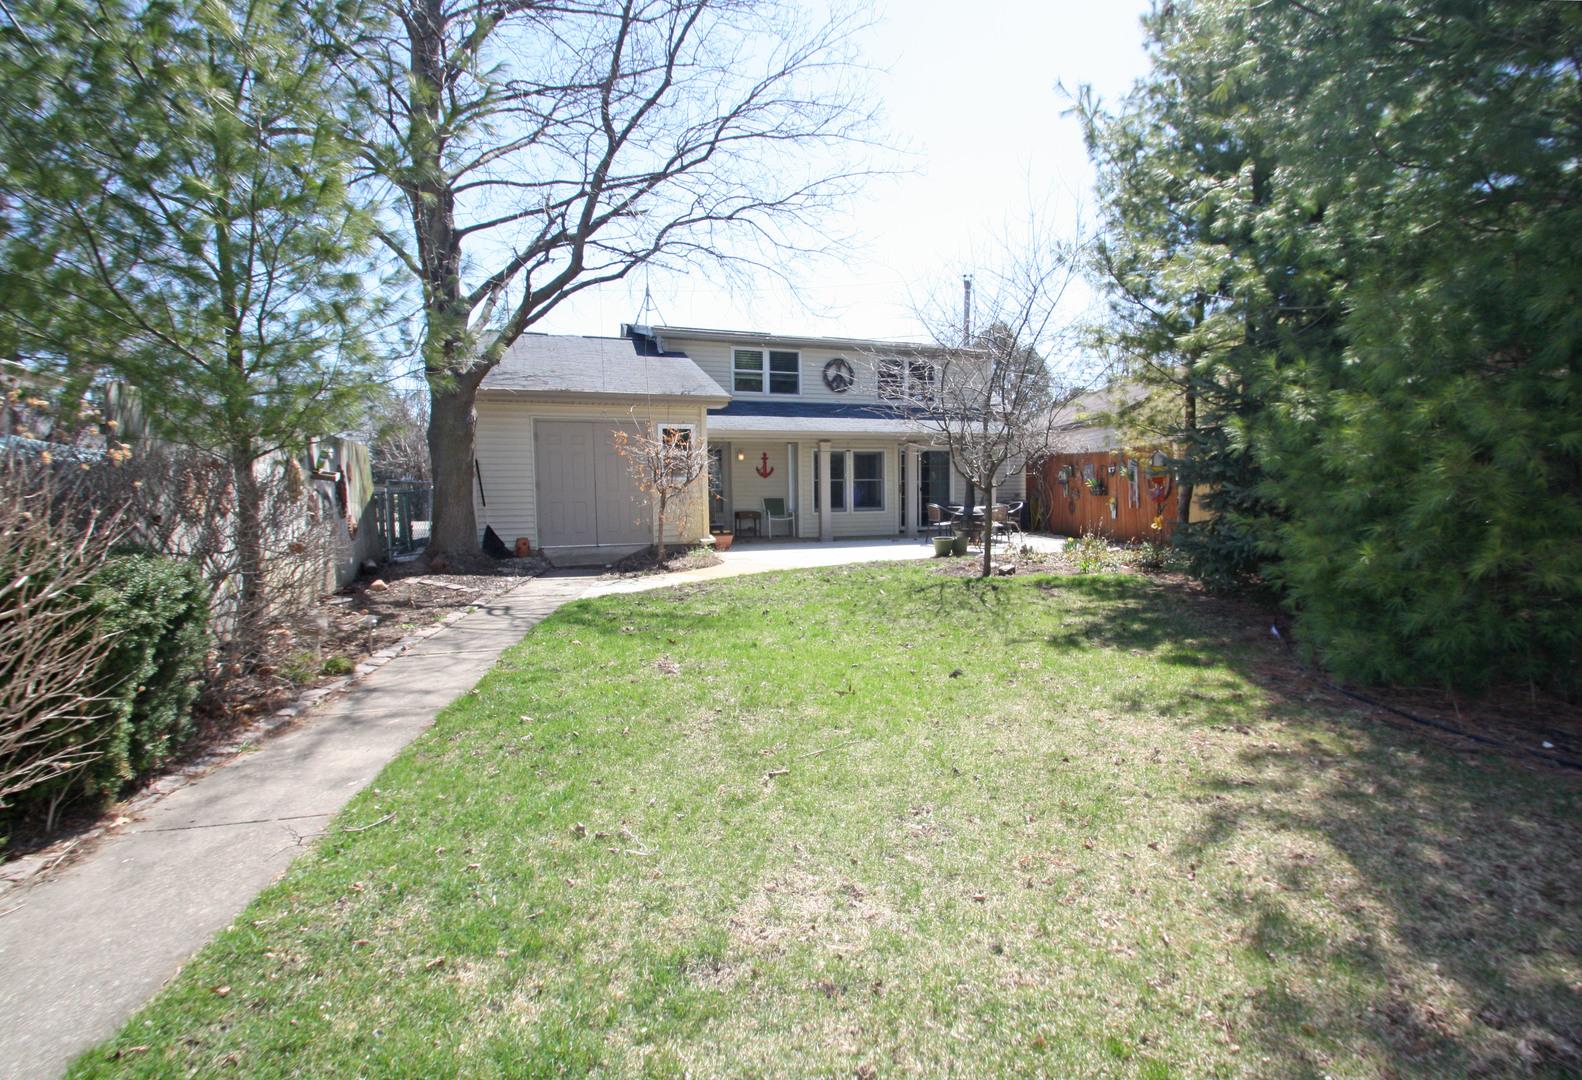 37650 North Terrace Lane, Spring Grove, Illinois 60081